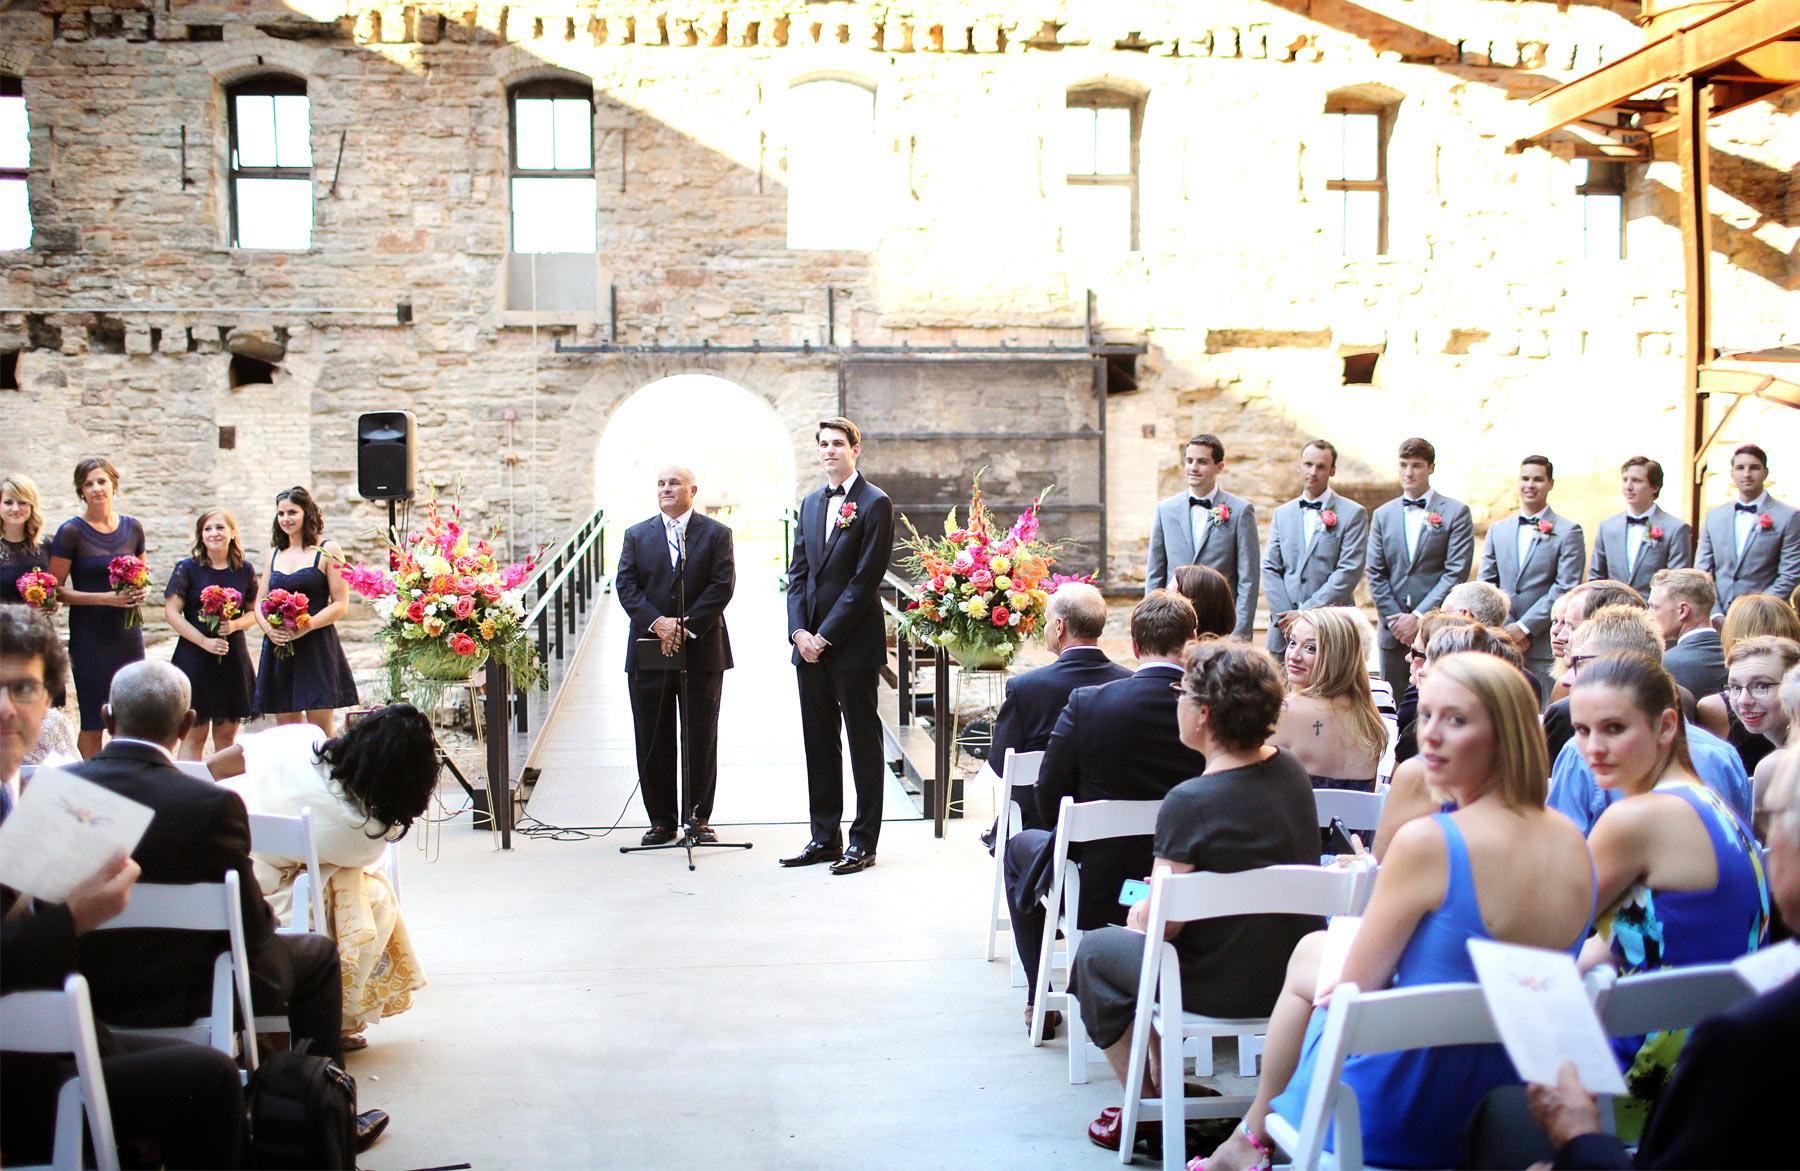 13-Minneapolis-Minnesota-Wedding-Photography-by-Vick-Photography-Downtown-Mill-City-Museum-Ceremony-Outdoor-Wedding-Lalu-&-John.jpg